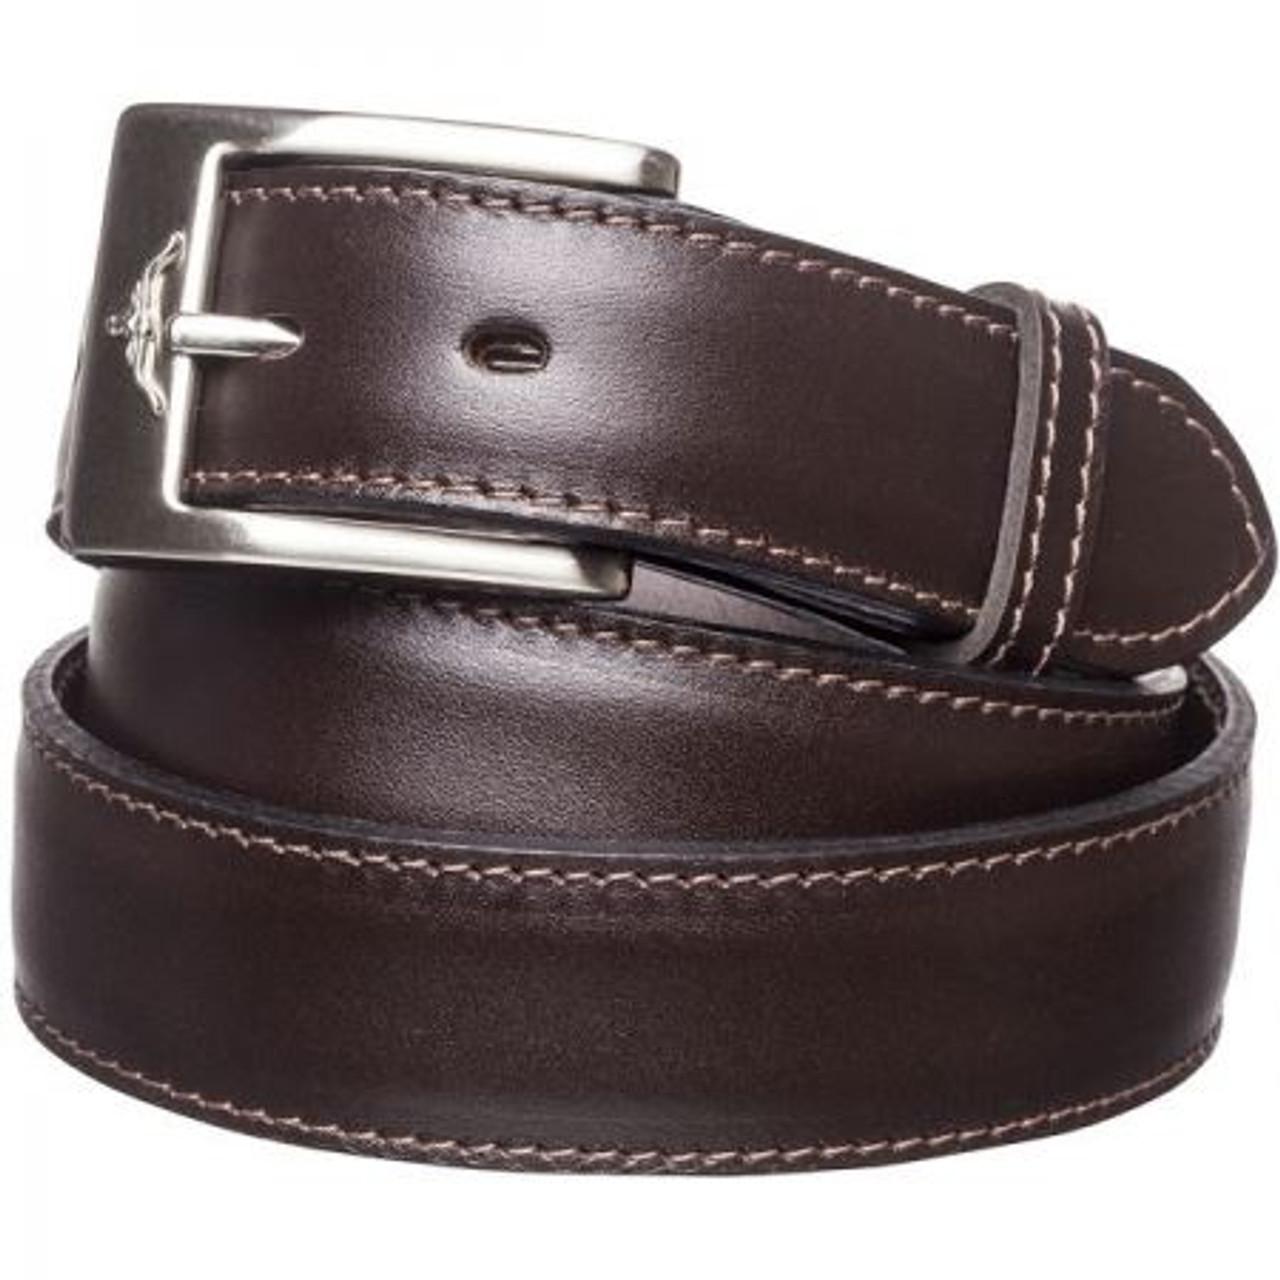 R.M. Williams 1.25 Inch Dress Belt